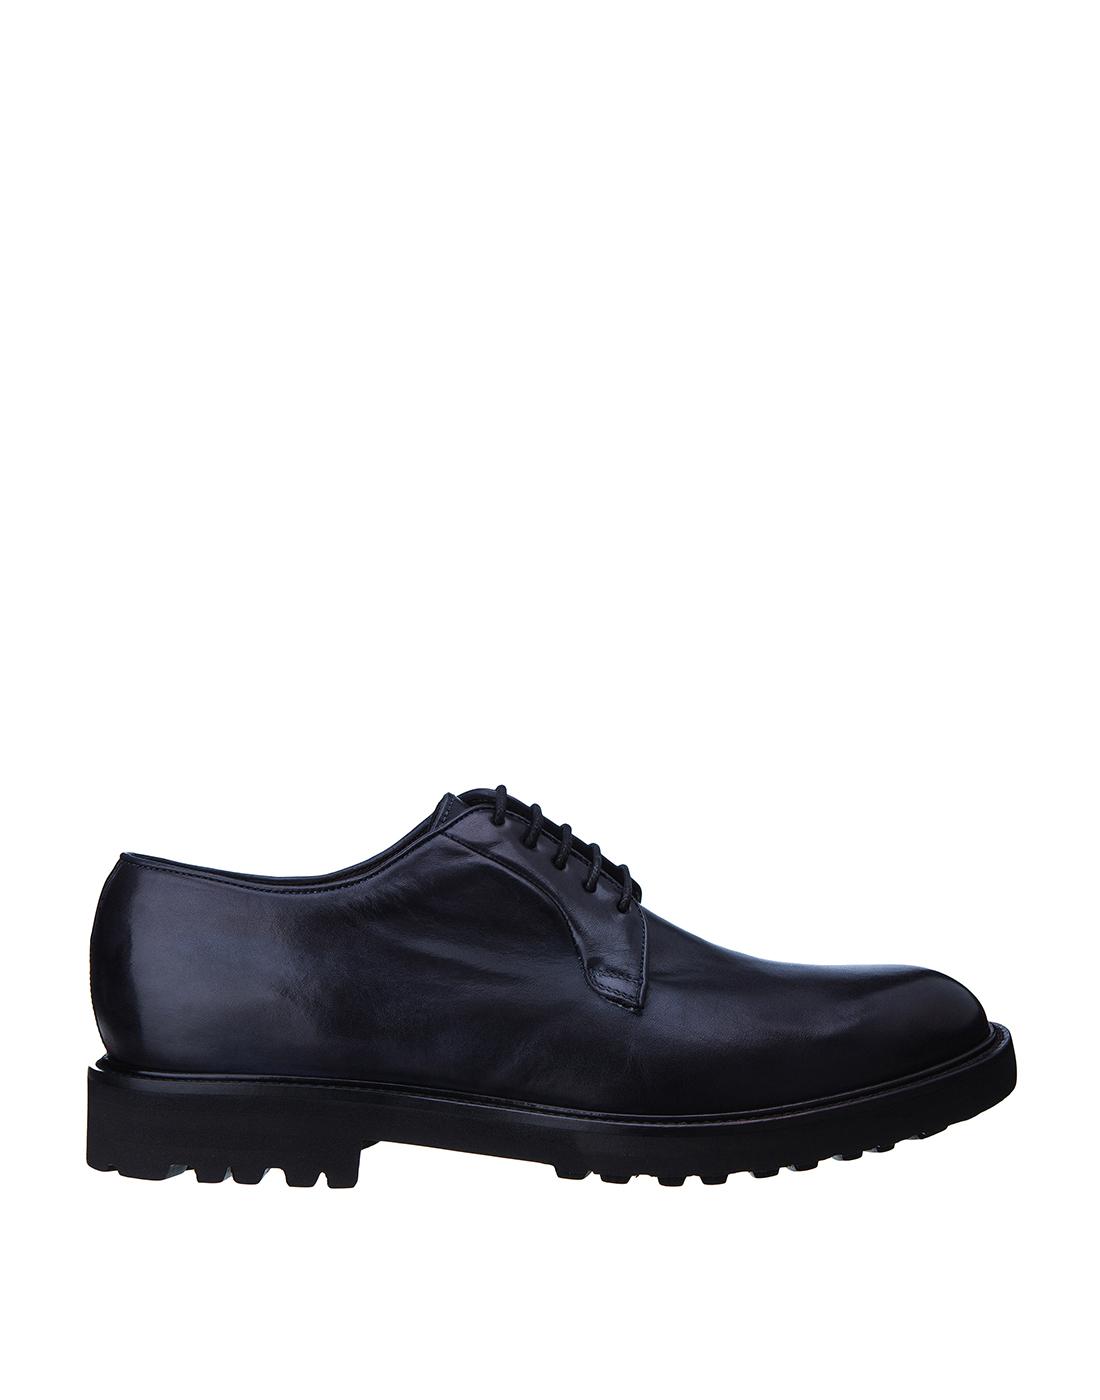 Туфли синие мужские Brecos S8066-1